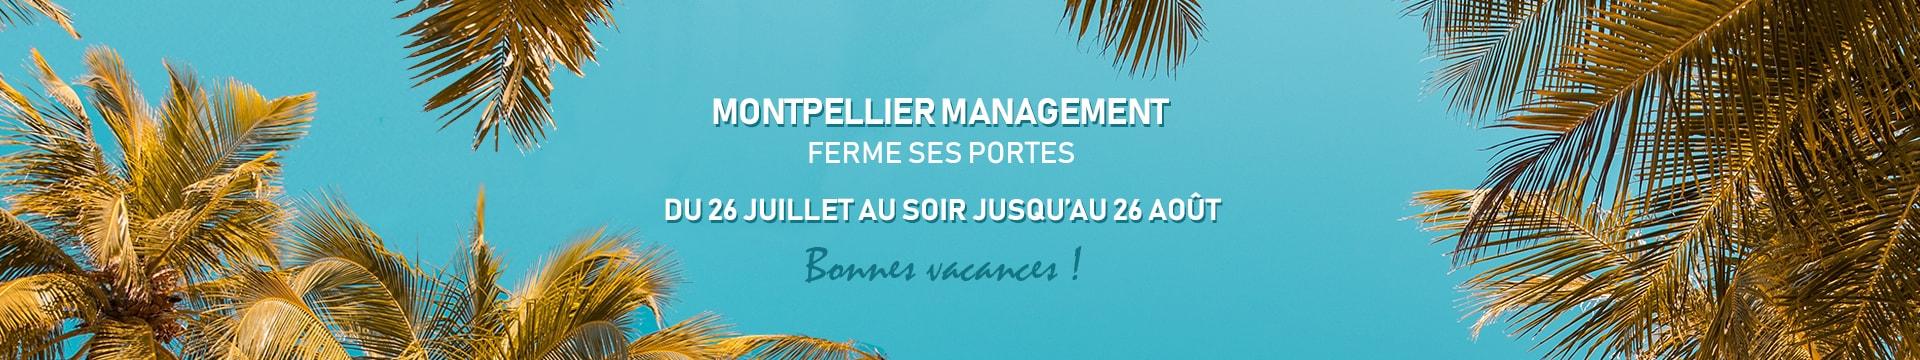 Fermeture 2019 - Montpellier Management